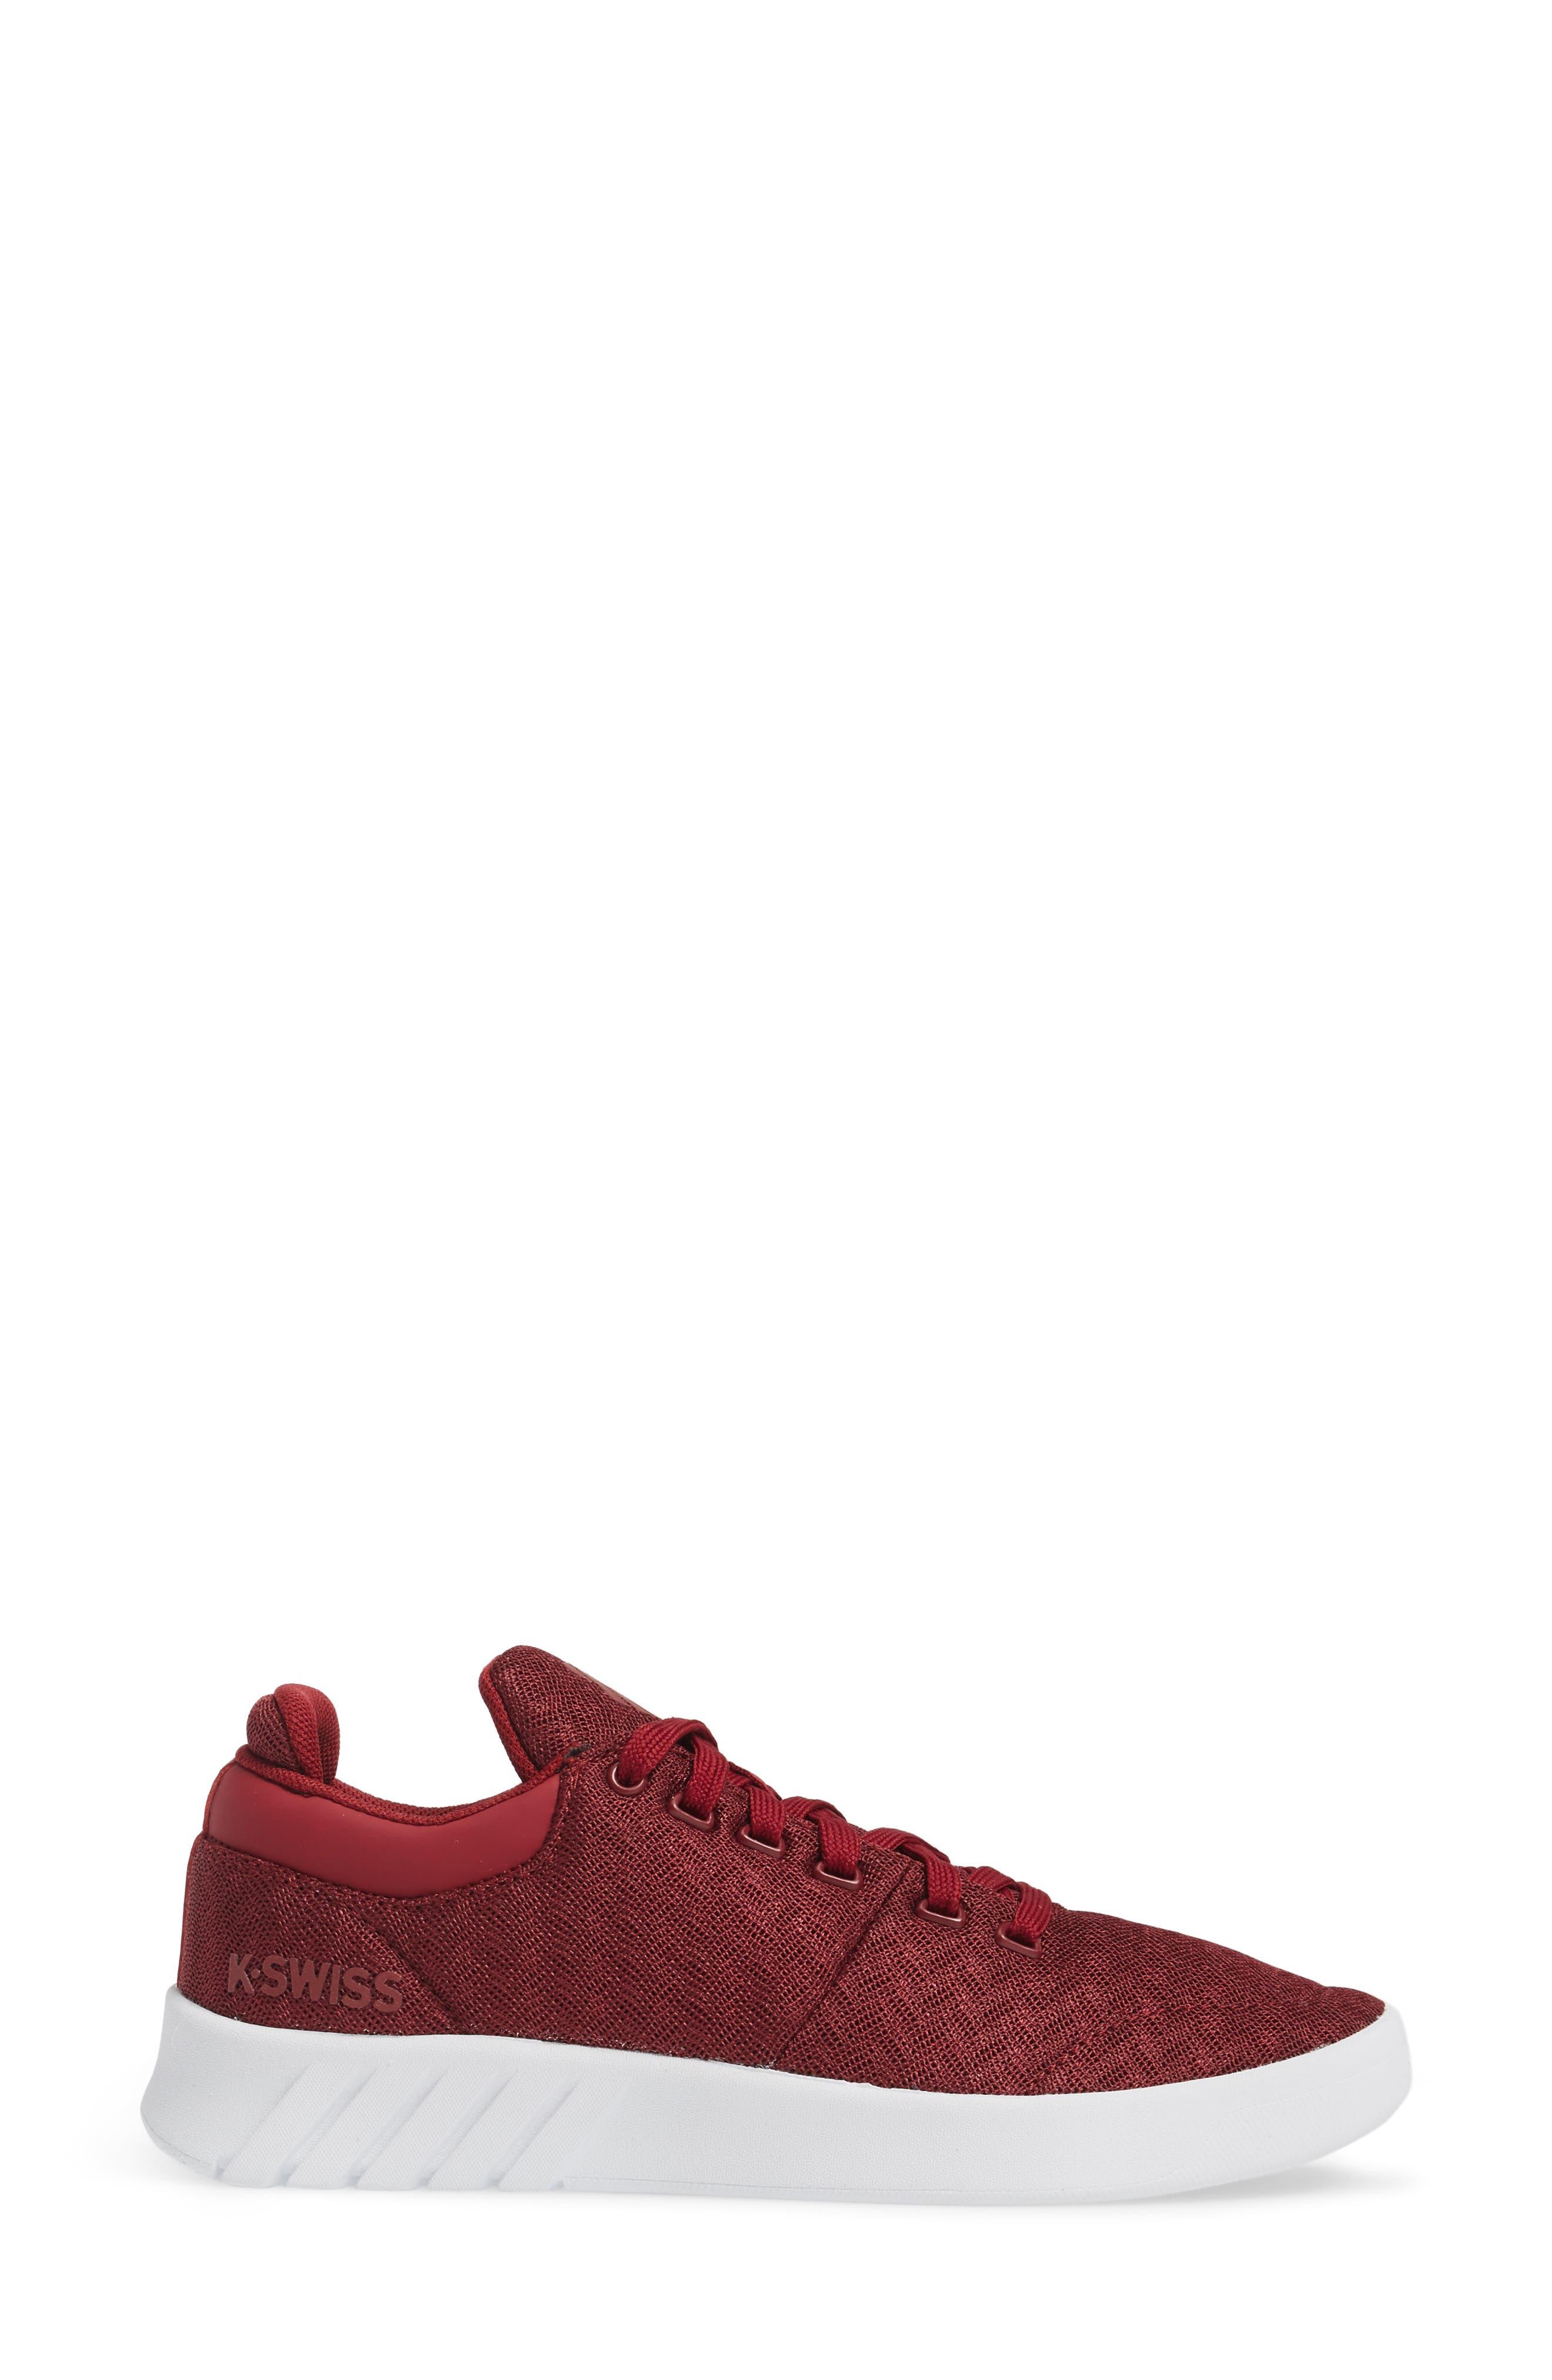 Aero Trainer T Sneaker,                             Alternate thumbnail 3, color,                             Tibetan Red/ White